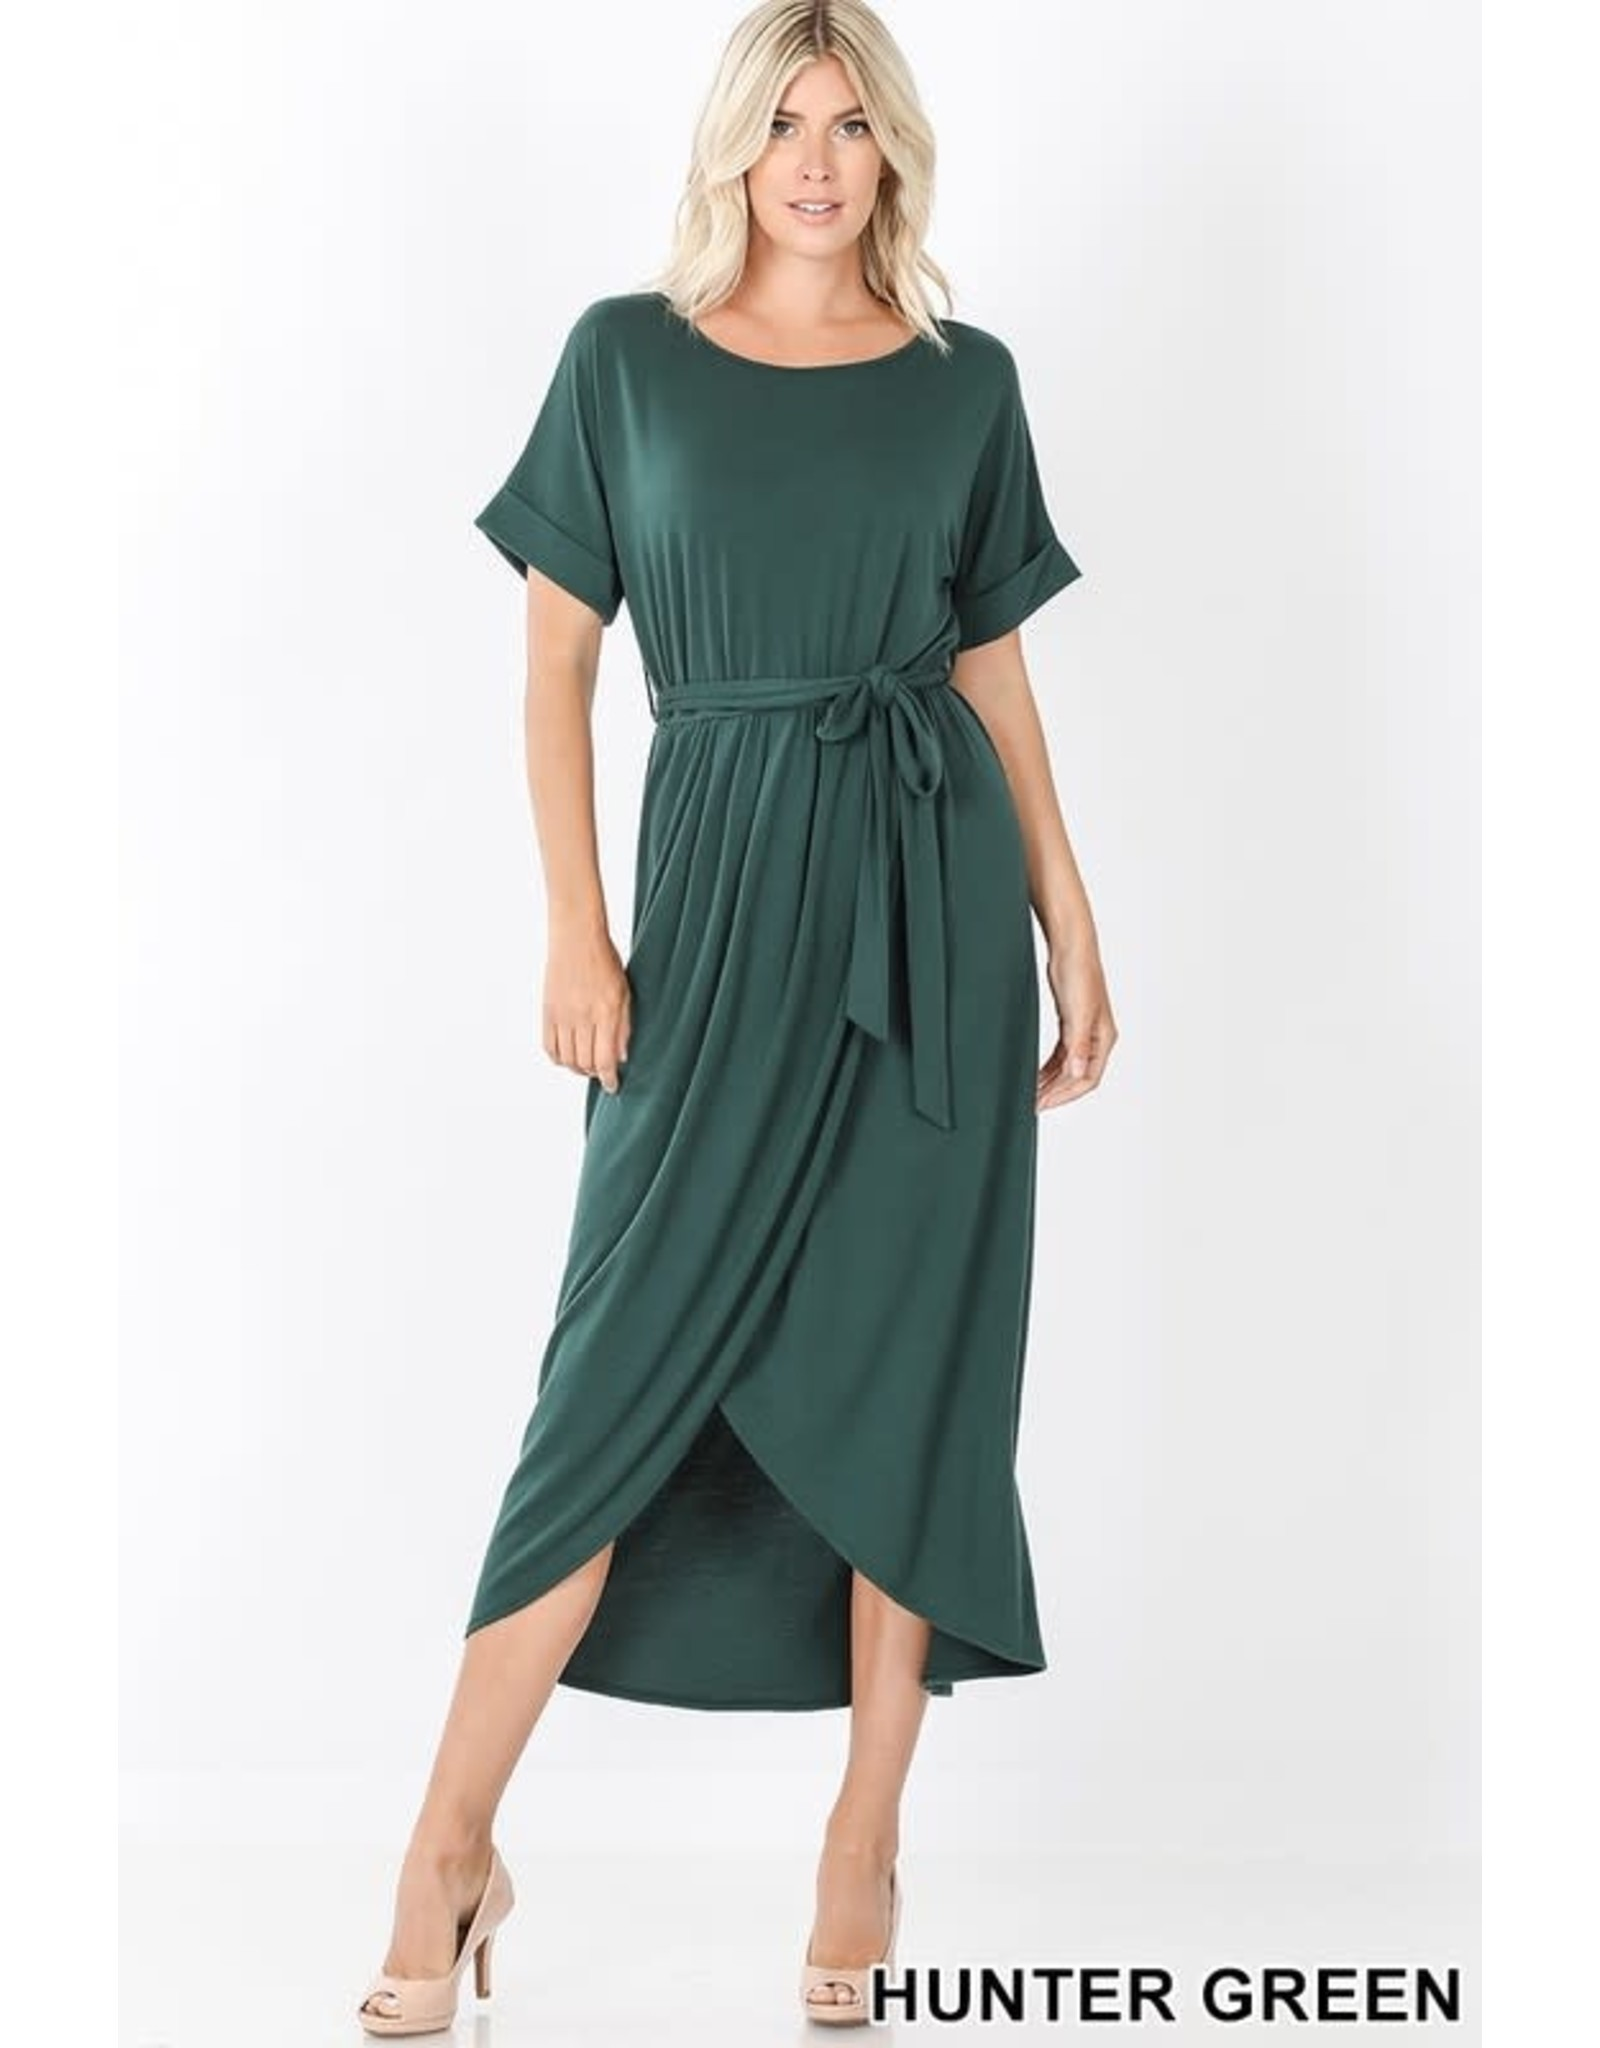 HUNTER GREEN BELTED SHORT SLEEVE TULIP DRESS